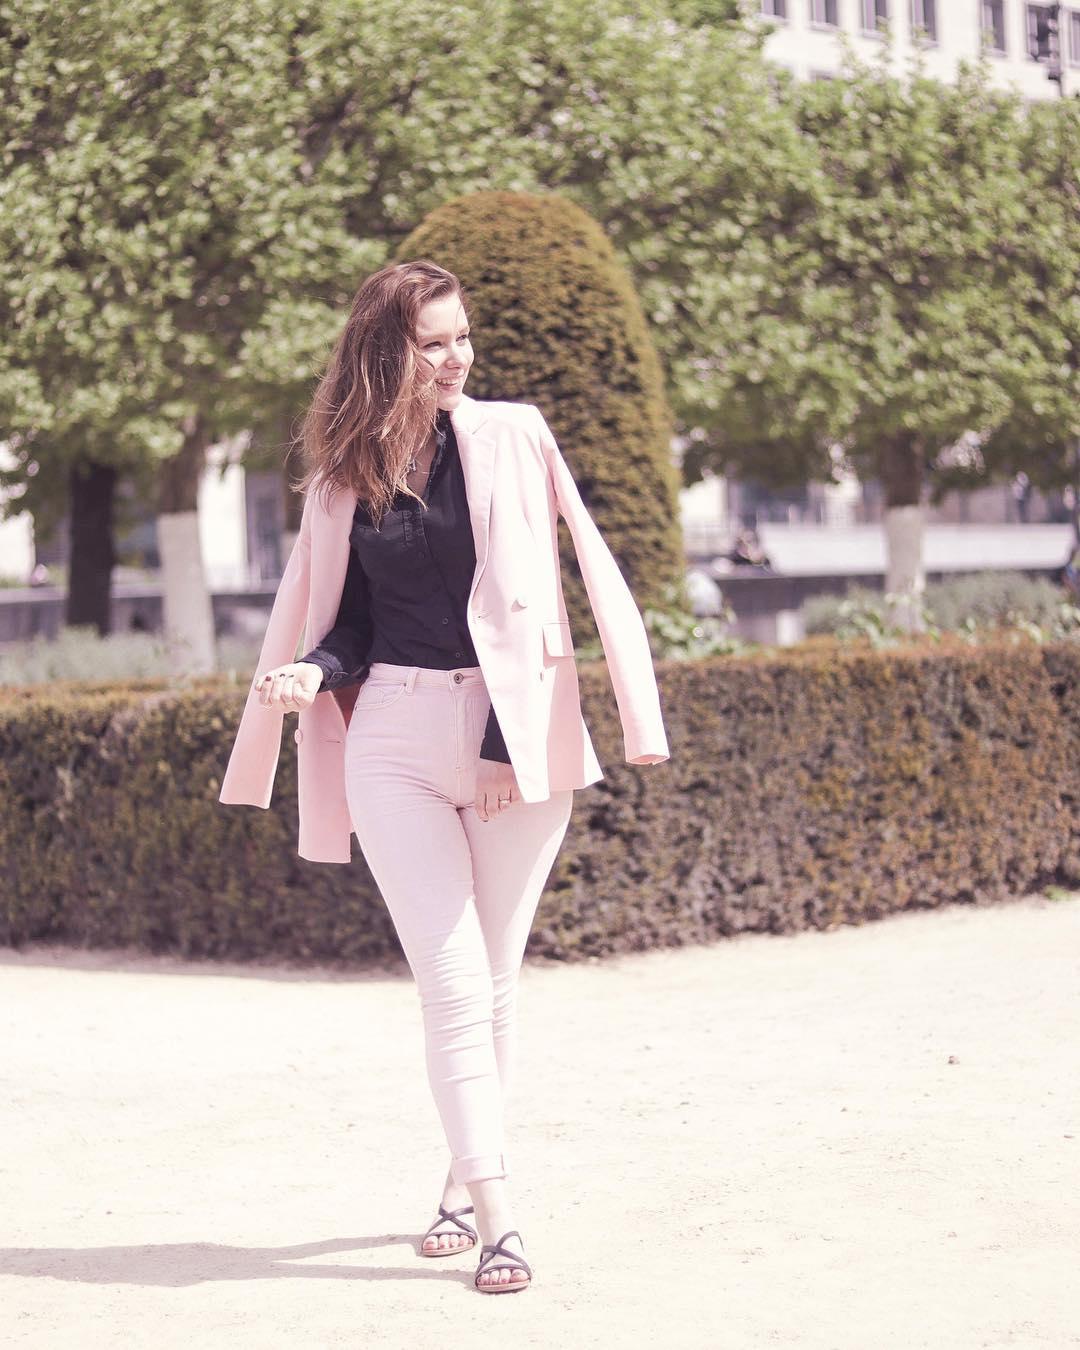 jeans toxic blanc de Les Bourgeoises sur _mangoo_tangoo_